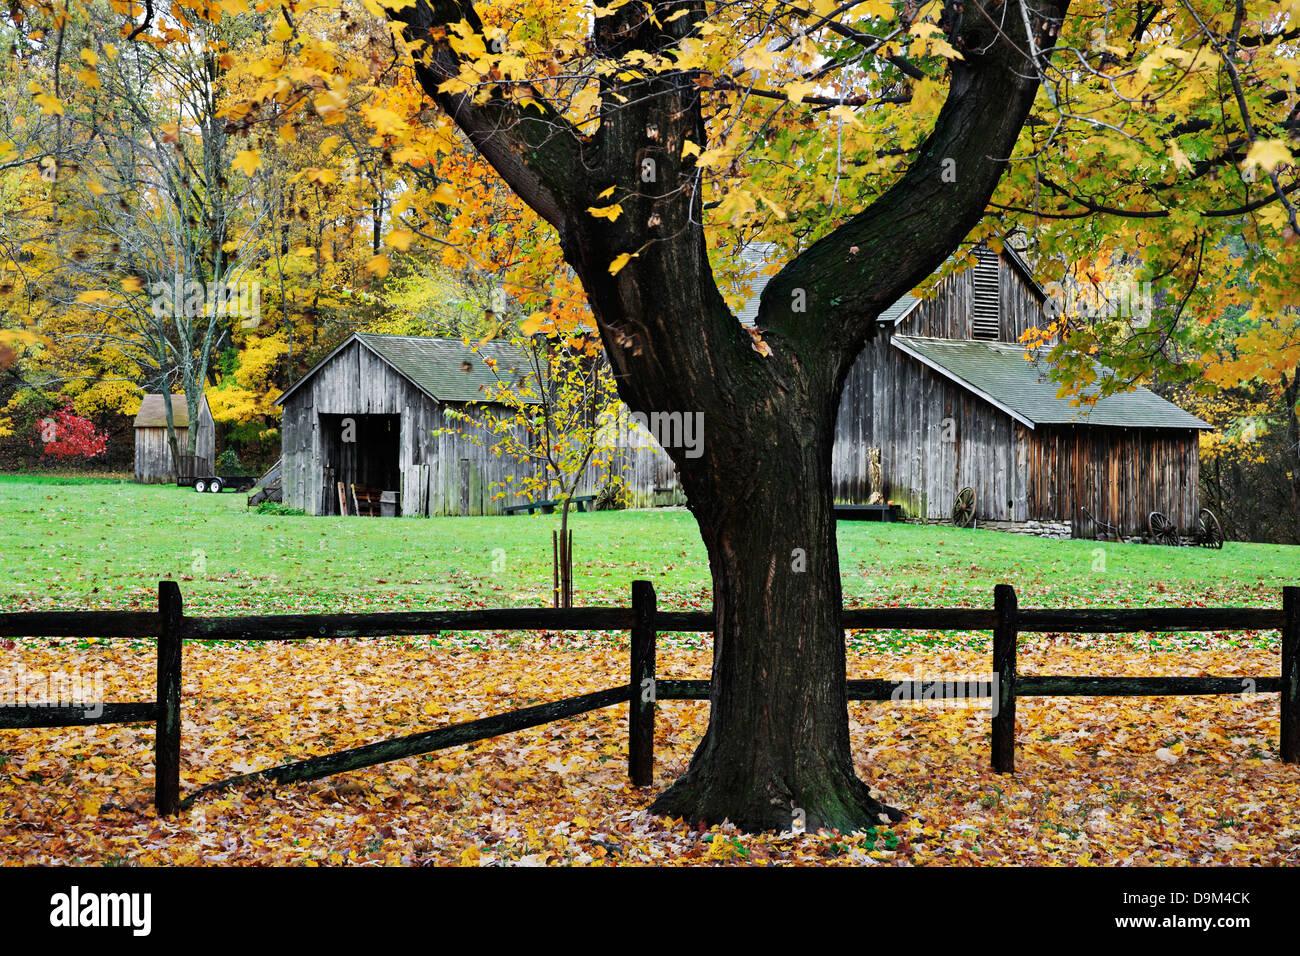 Tree Trunk, Fence And Barn, A Pastoral Autumn Scene, Sharon Woods, Southwestern Ohio, USA - Stock Image